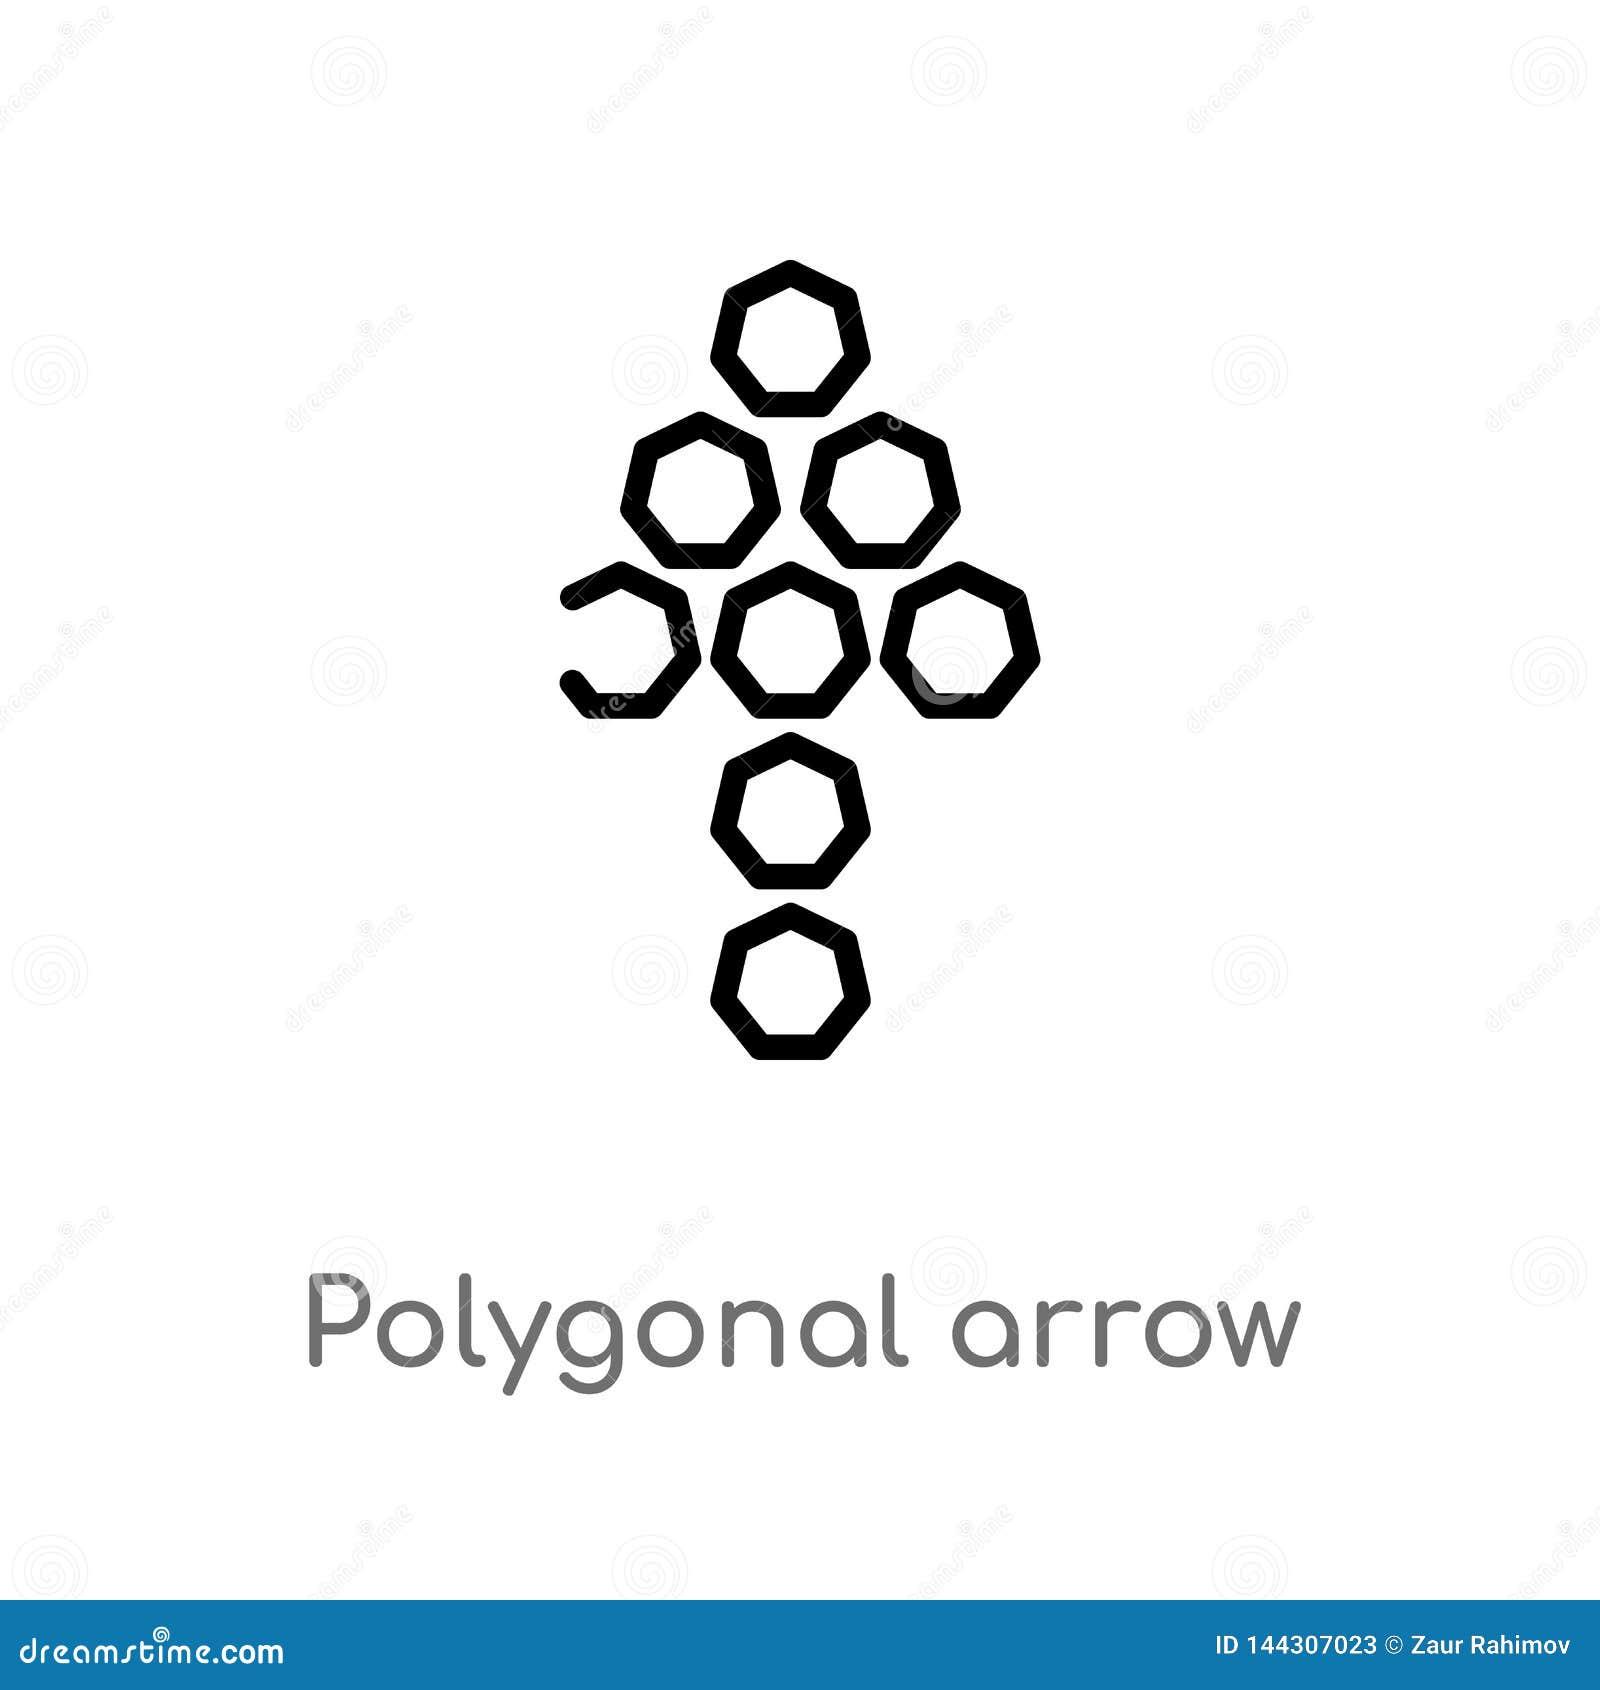 Flecha poligonal del esquema encima del icono del vector l?nea simple negra aislada ejemplo del elemento del concepto de la geome